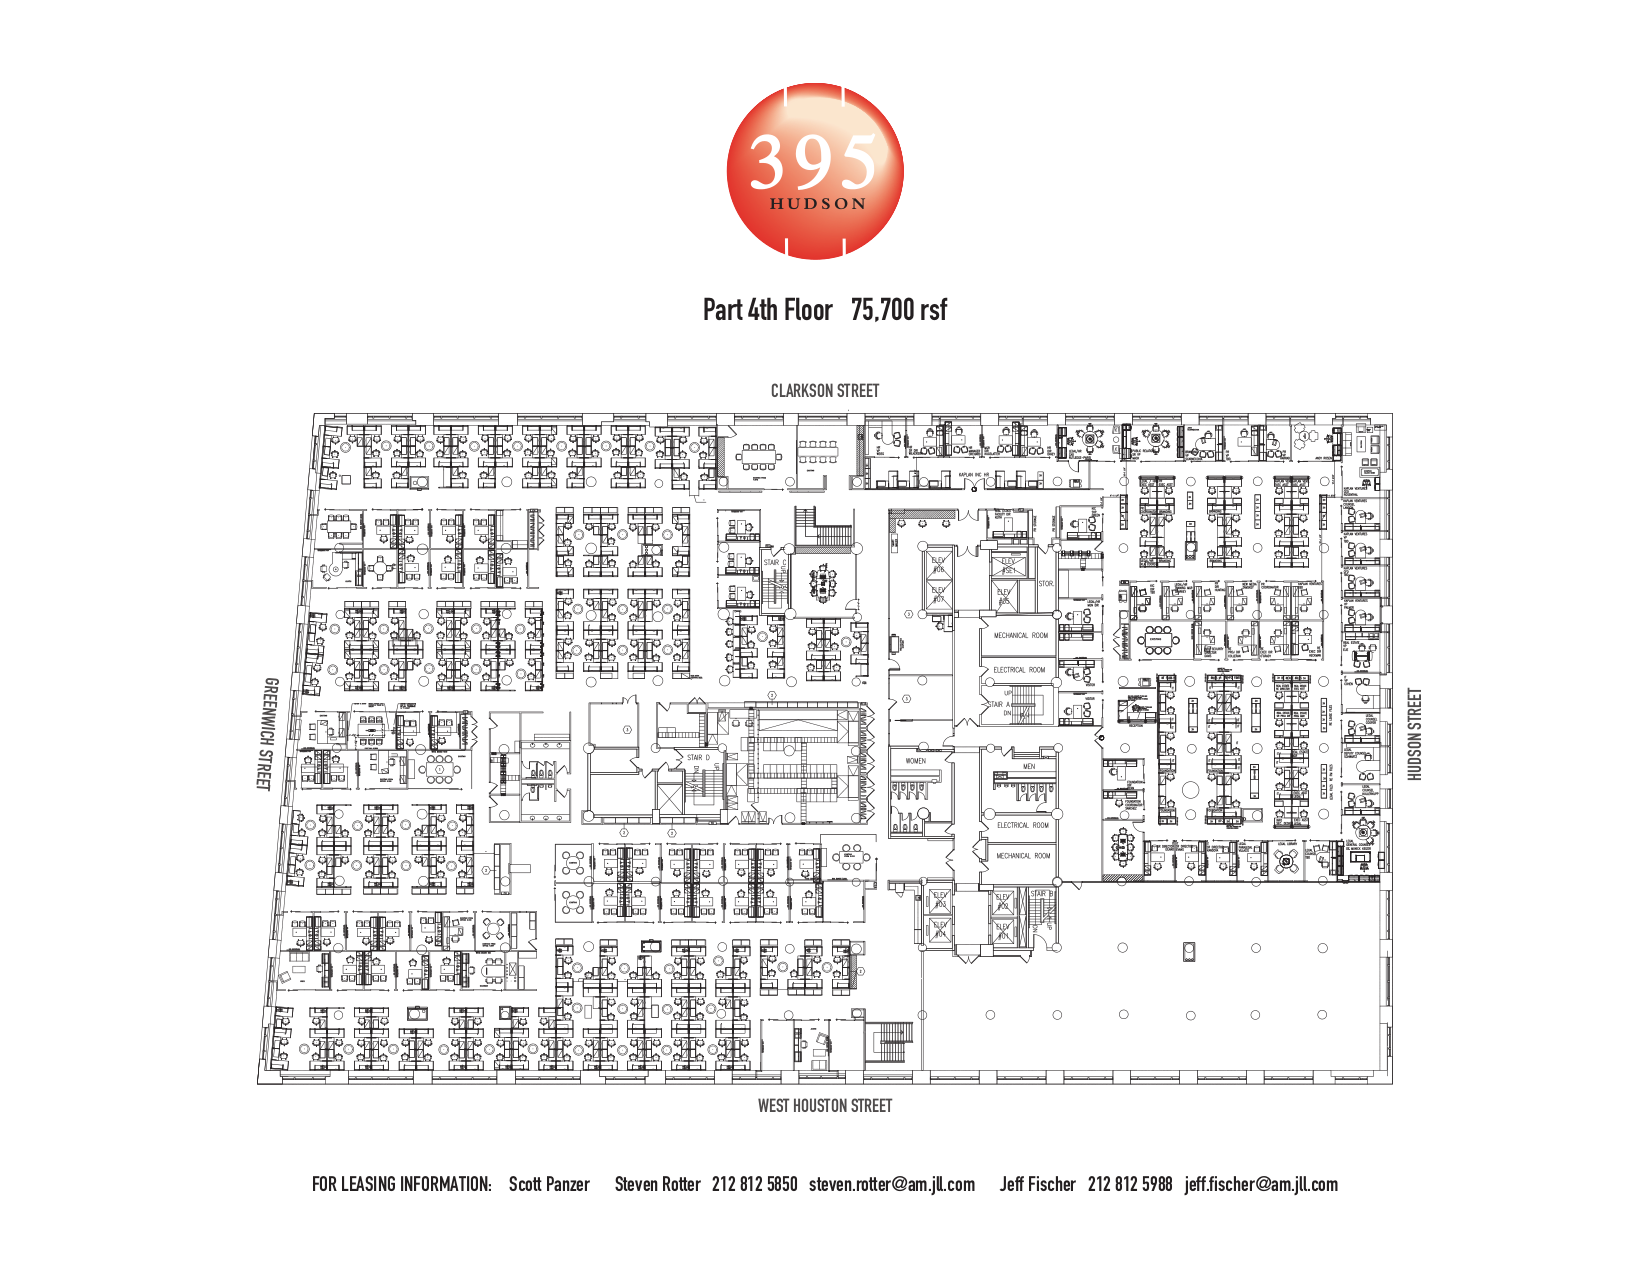 395 hudson street 4th floor vts for 10 rockefeller plaza 4th floor new york ny 10020